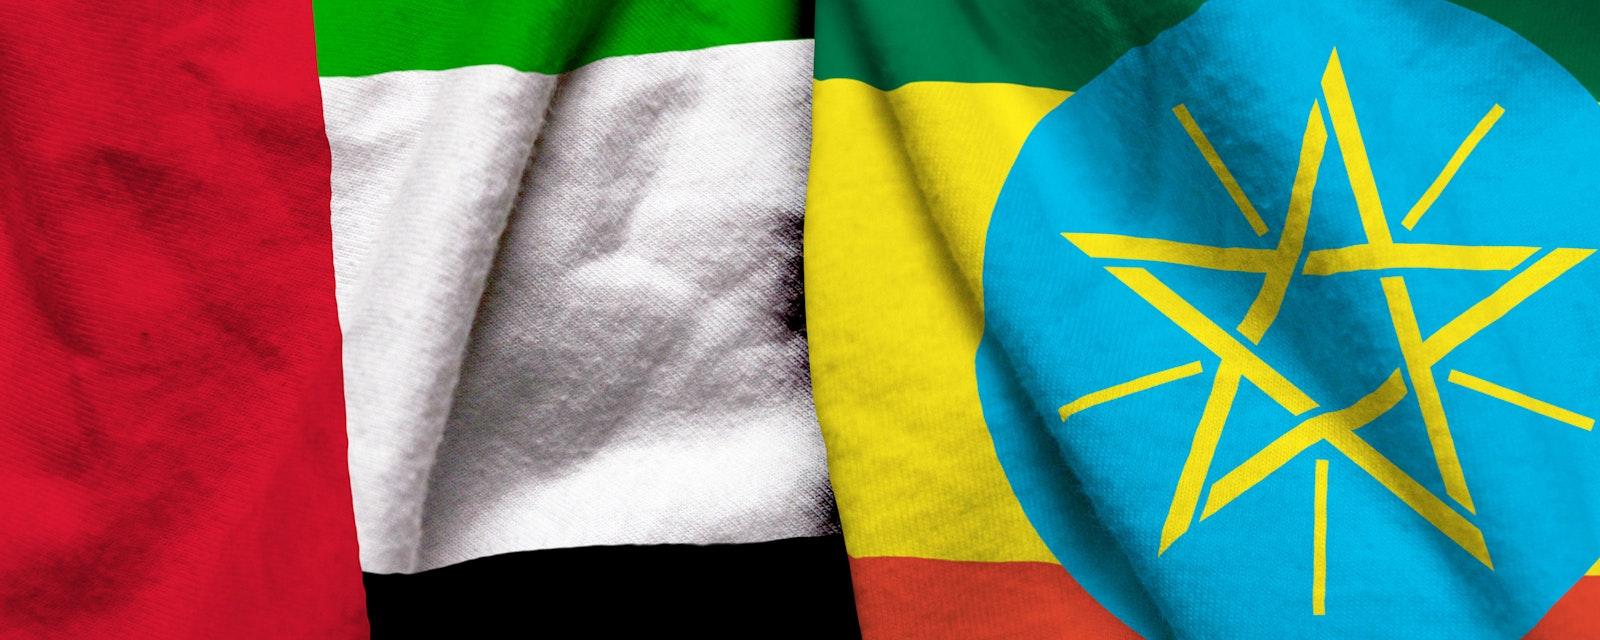 United Arab Emirates and Ethiopia flag on cloth texture